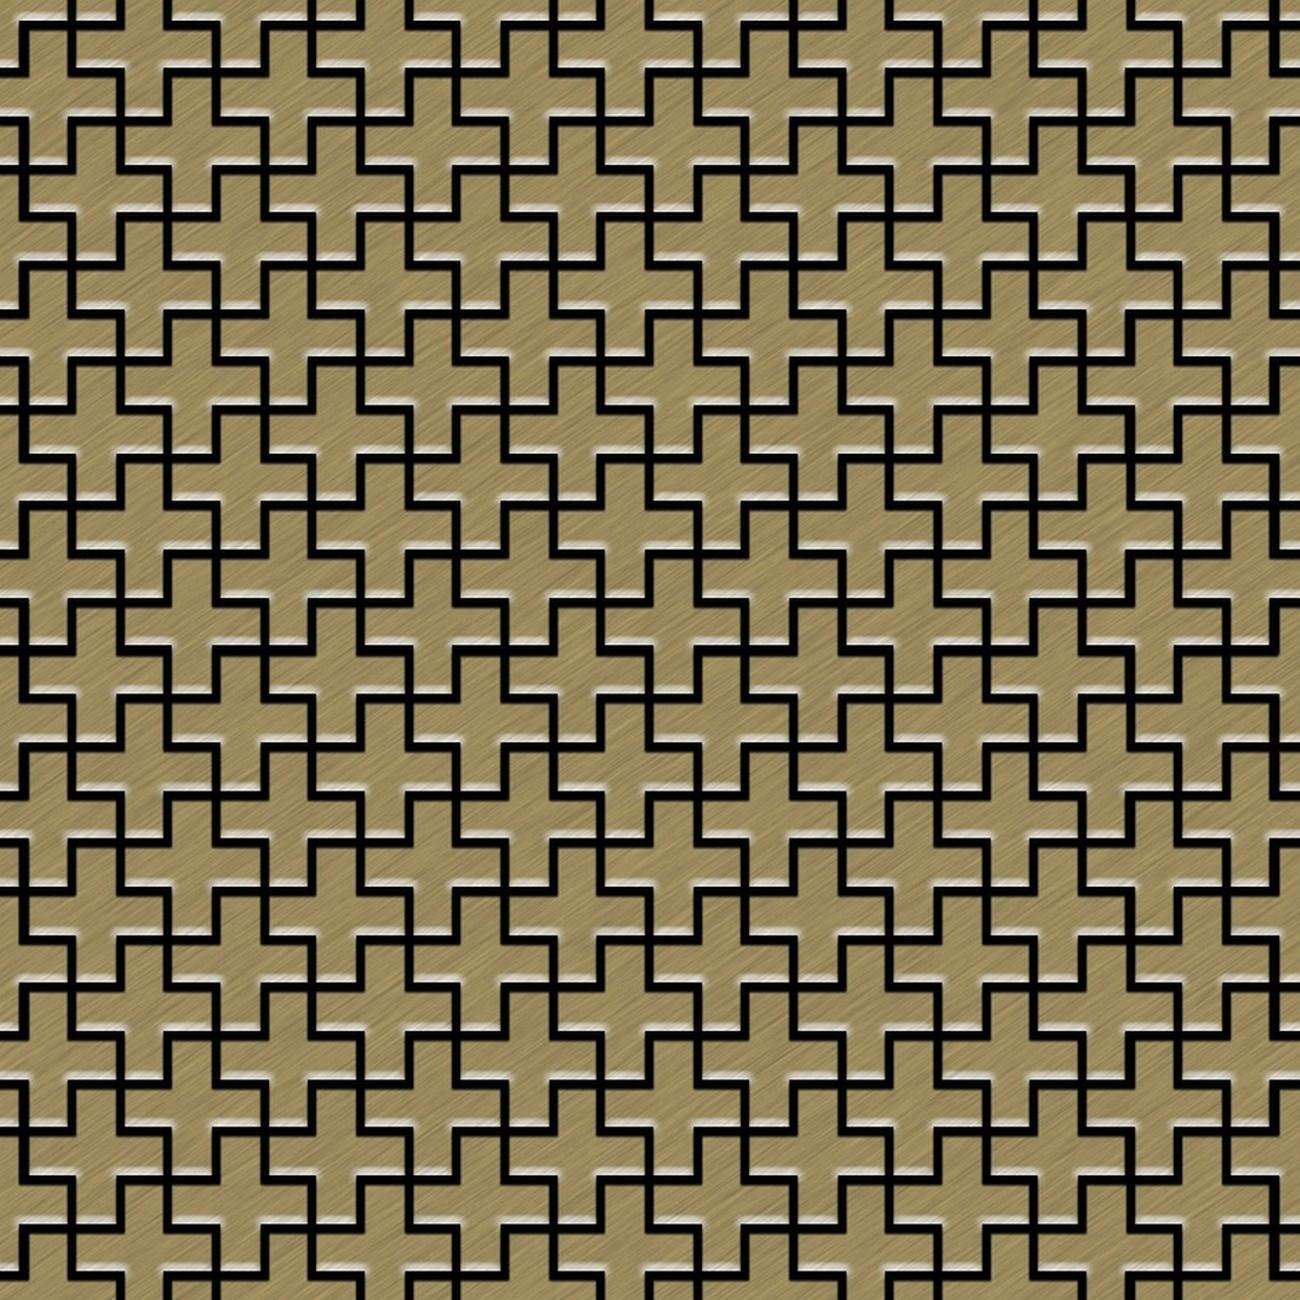 Azulejo mosaico de metal s lido titanio gold cepillado oro for Azulejo mosaico